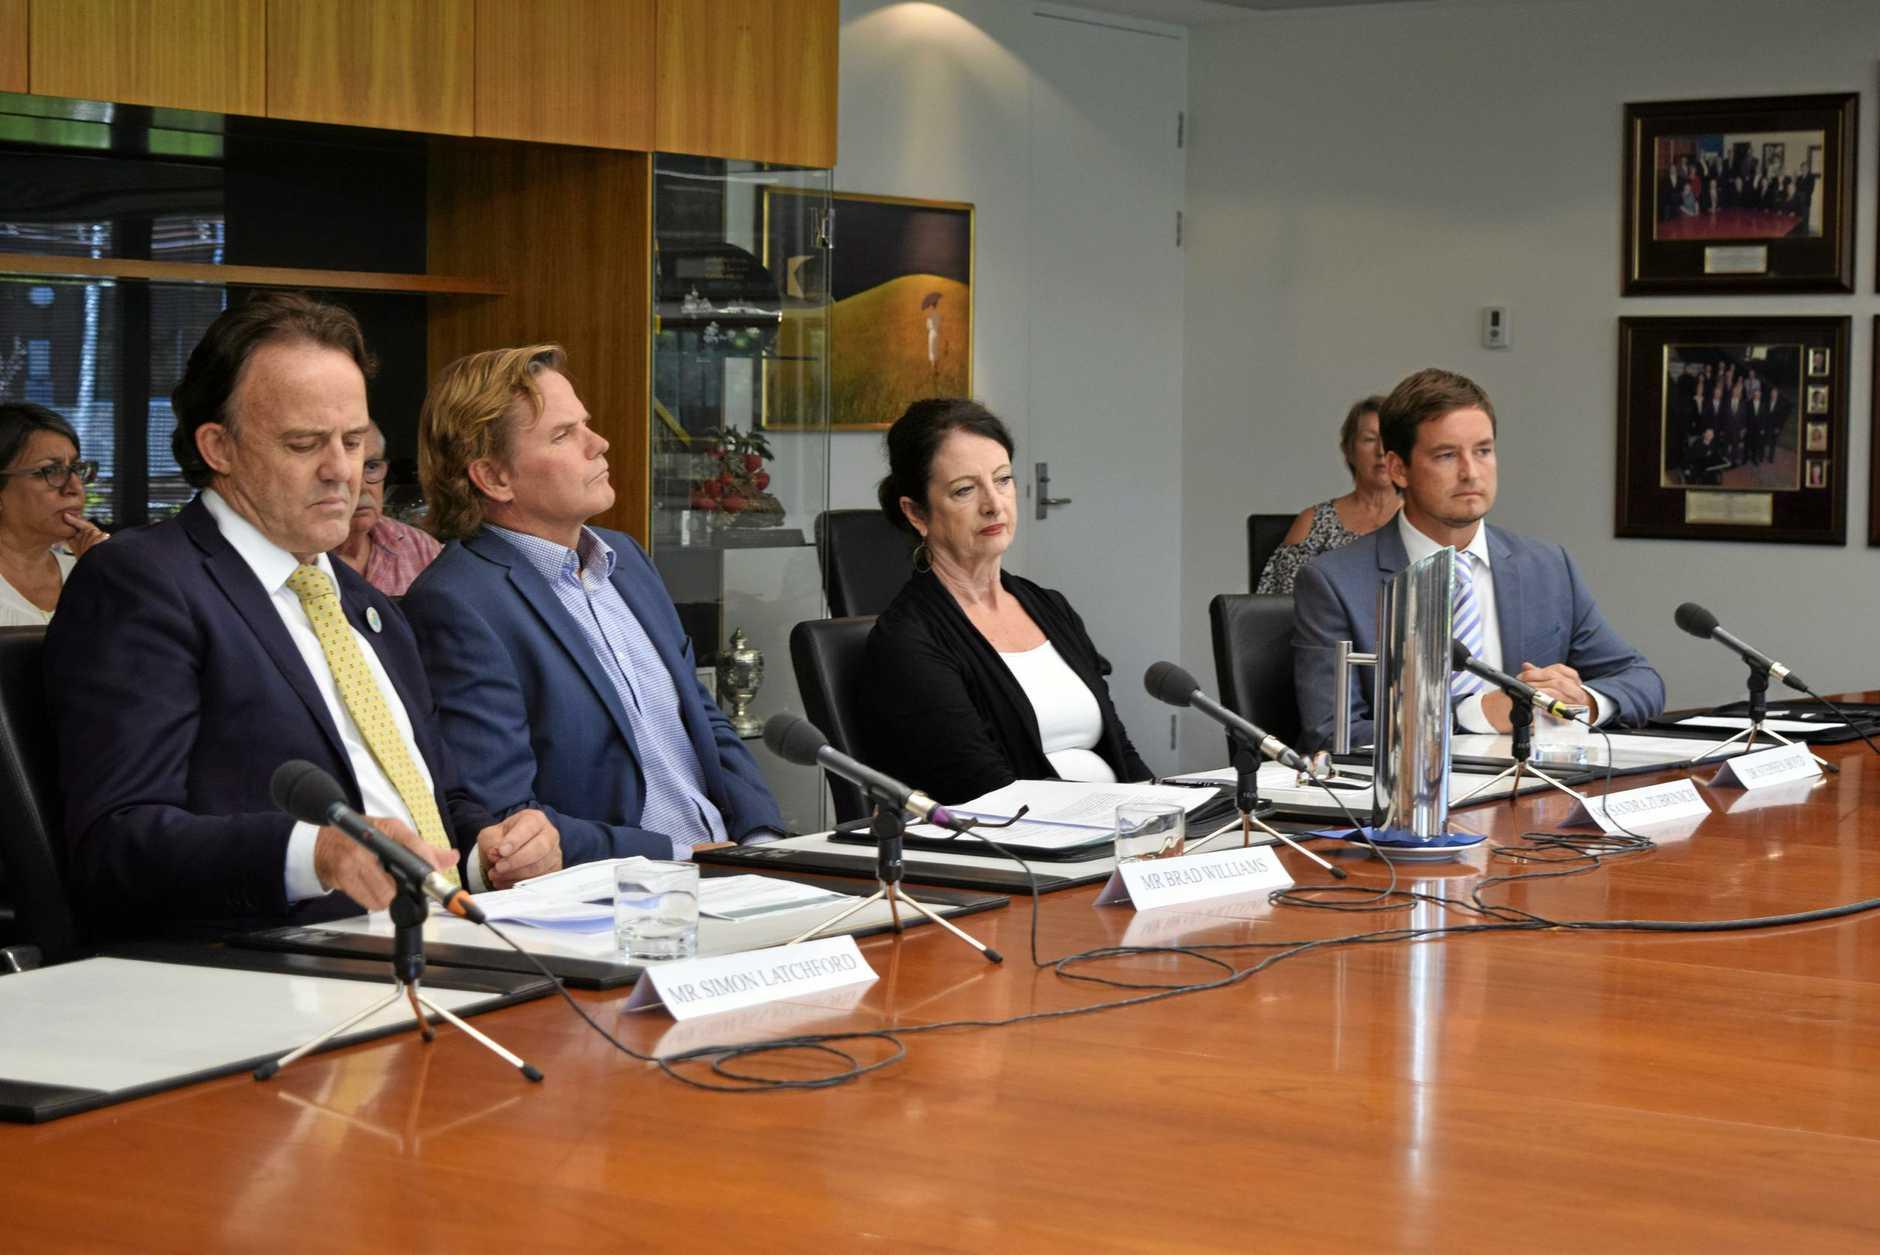 Simon Latchford, Brad Williams, Sandra, Zubrinich and Dr Steven Boyd.